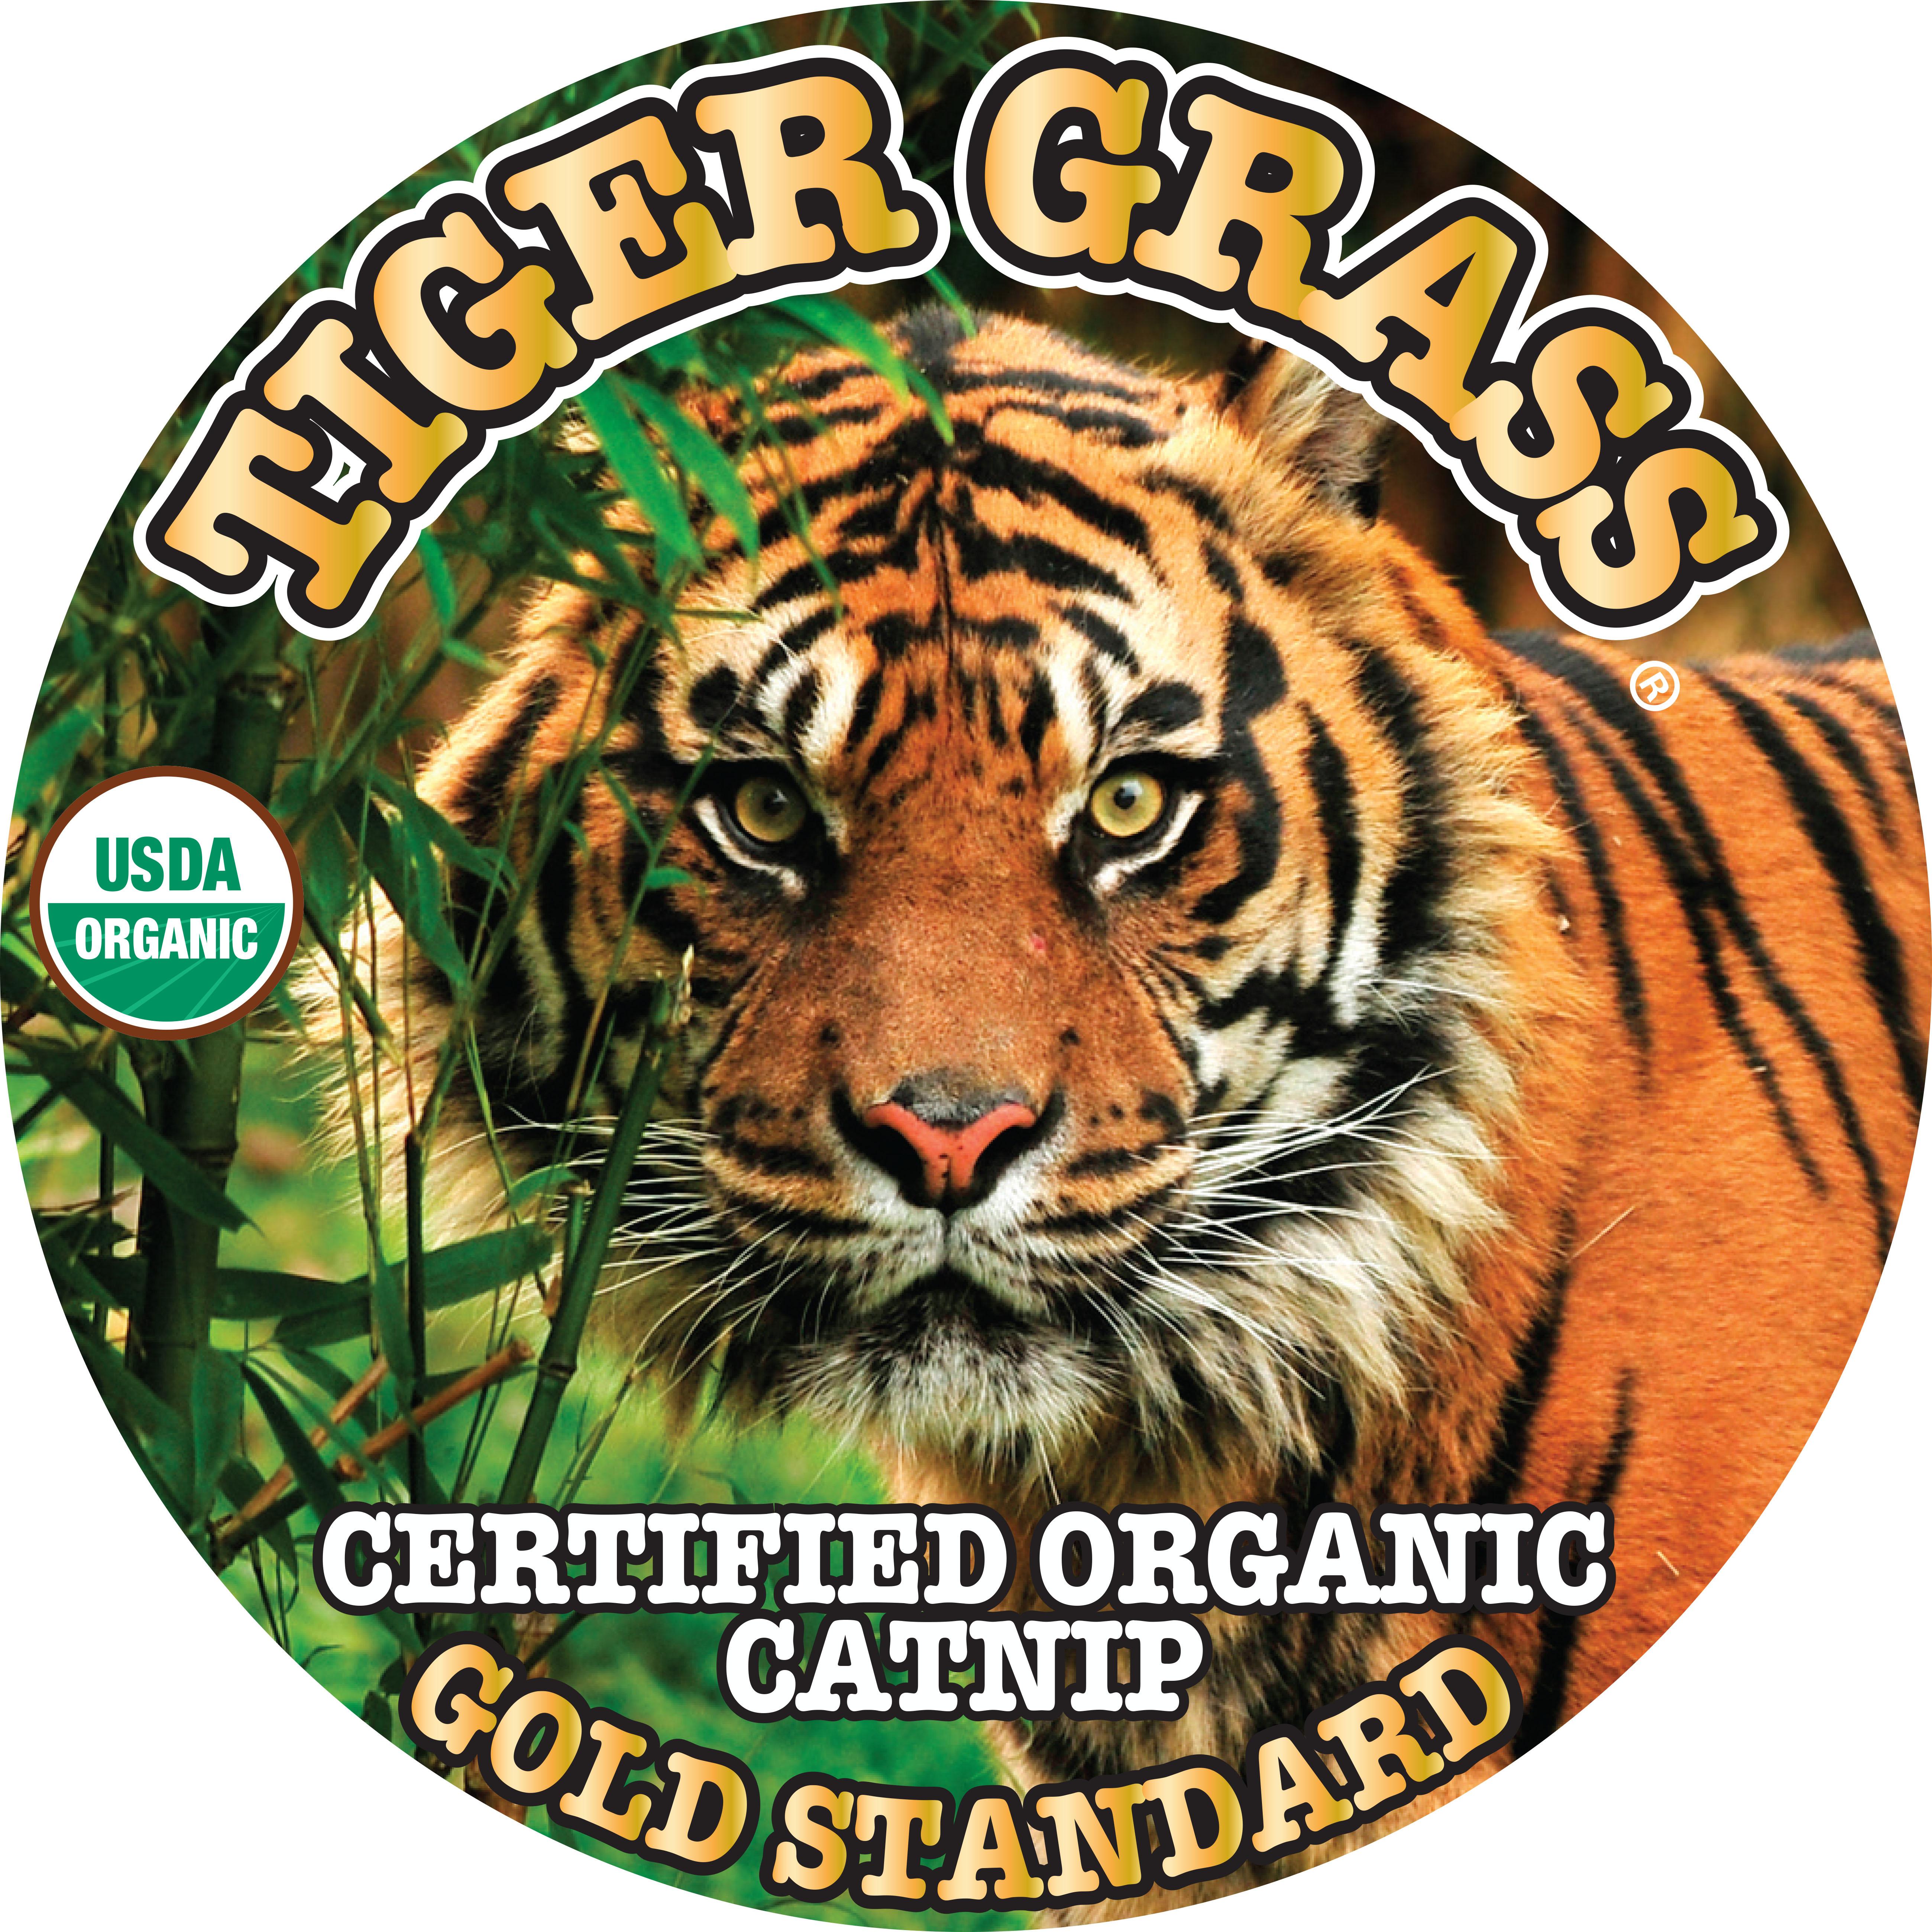 Tiger Grass logo